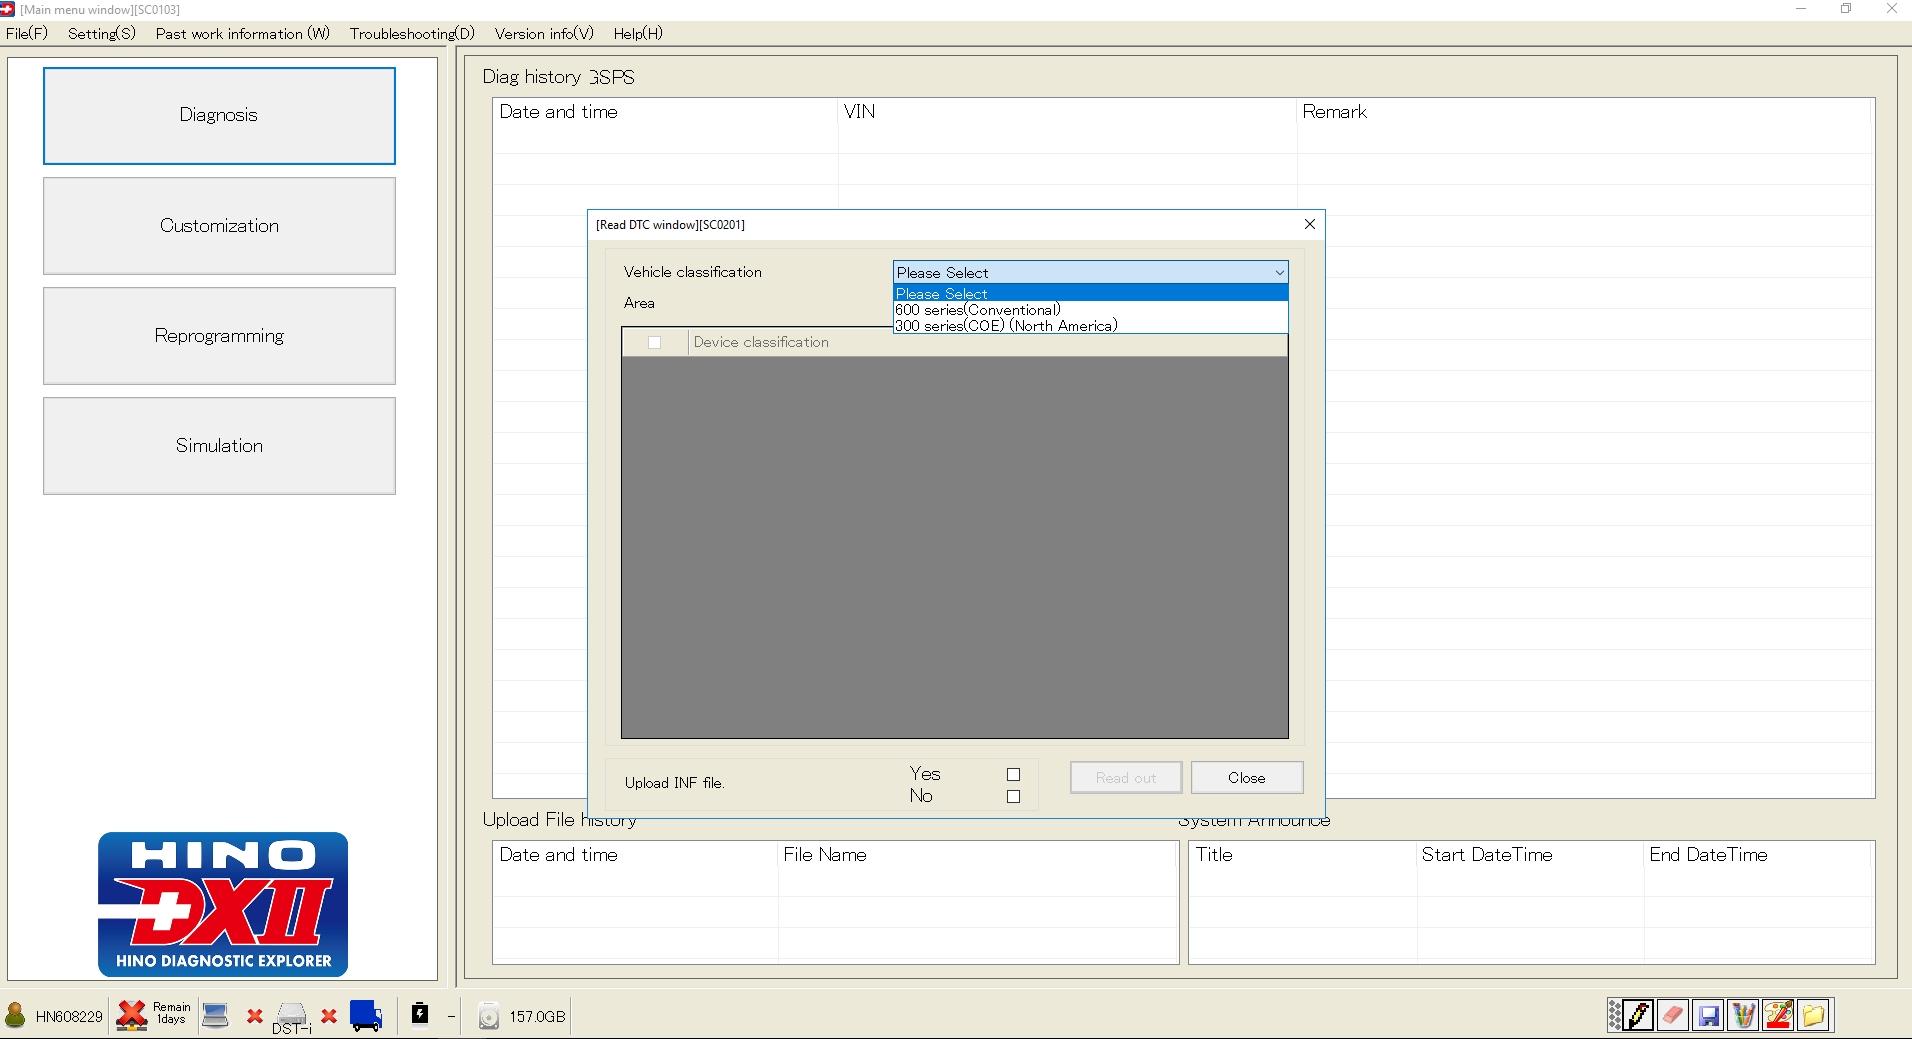 HINO_Diagnostic_eXplorer_DX2_11207_072020_Diagnostic_Software_3